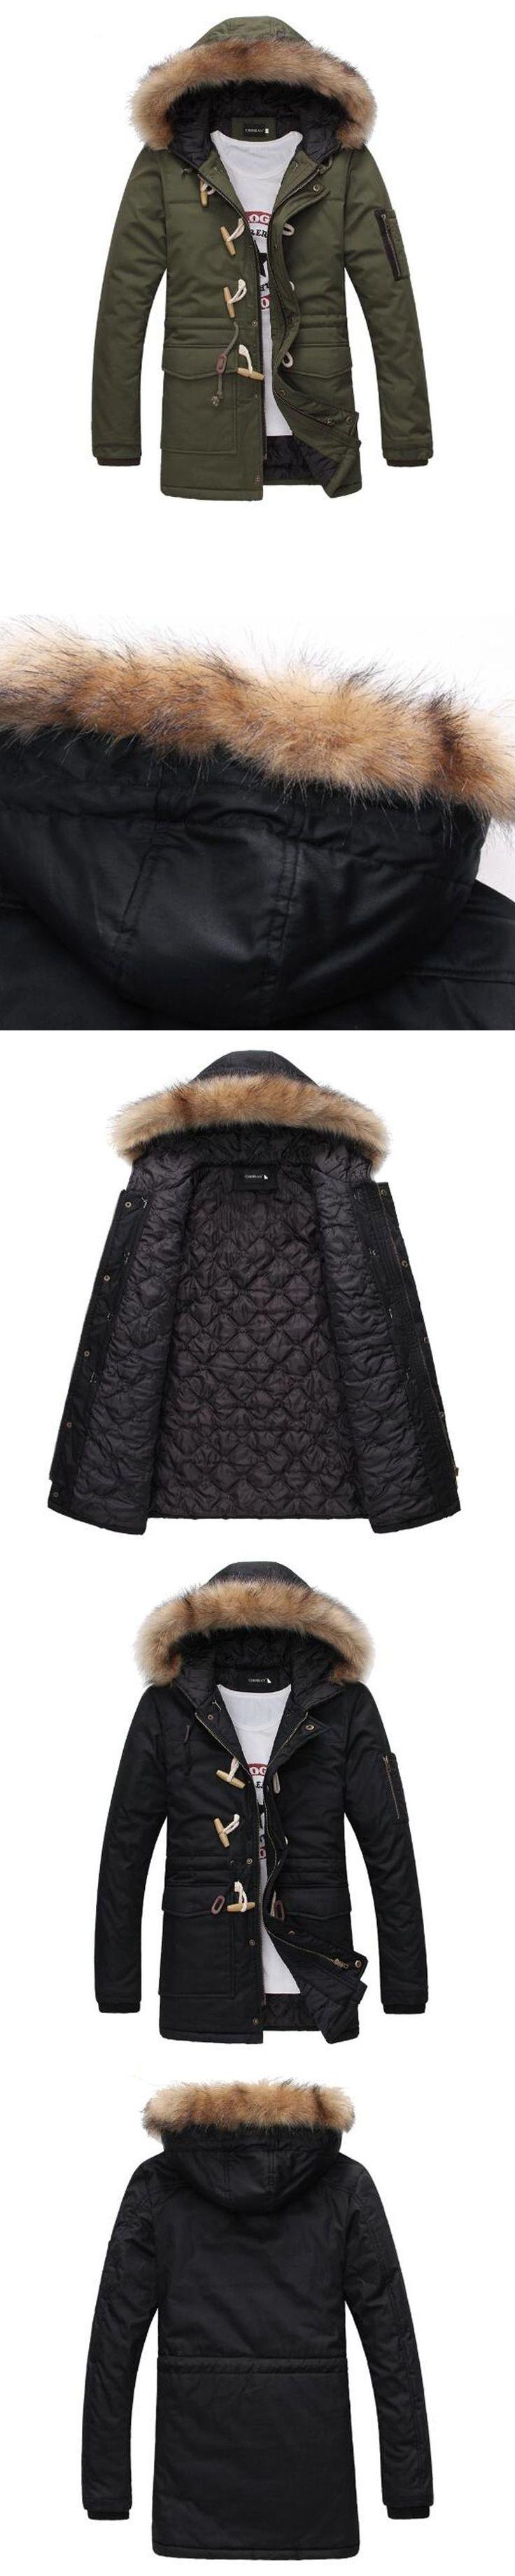 New Sale Winter Down Cotton Jacket Men Fashion Nagymaros Collar Coats Overcoat Men'S Thick Warm Winter Down Parkas #Down&Parkas